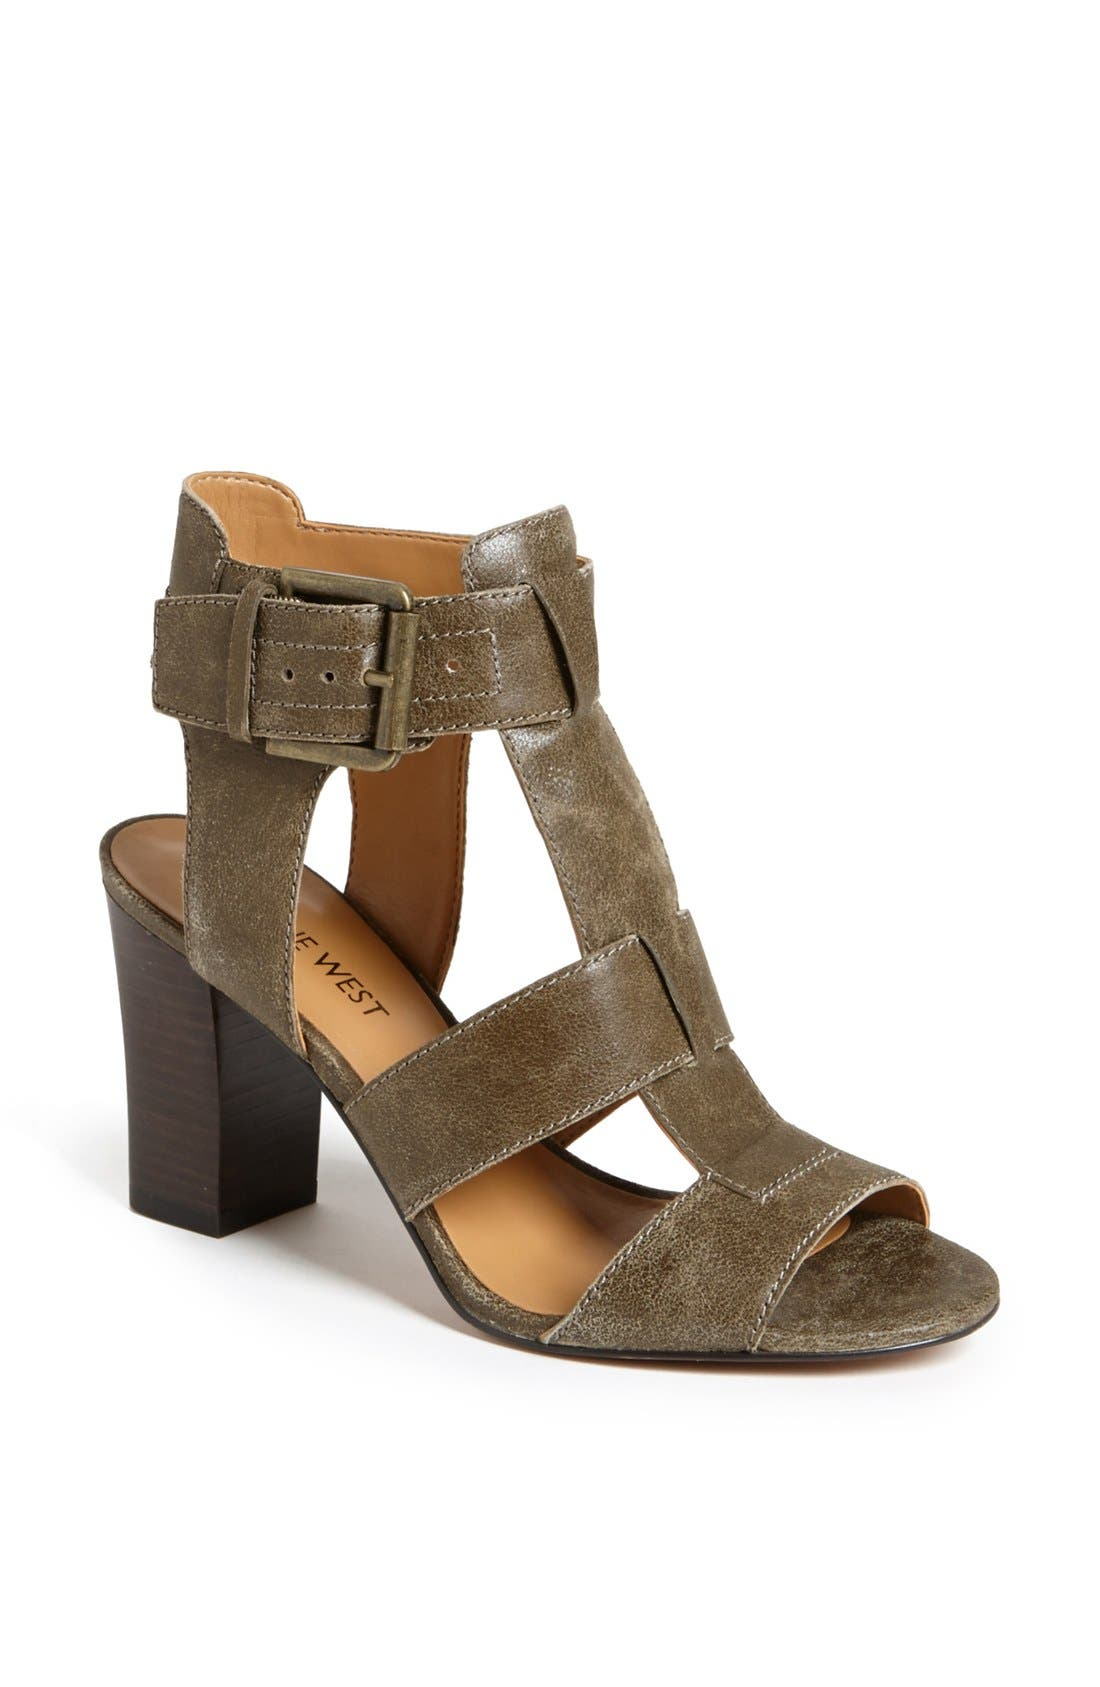 Main Image - Nine West 'Jerianne' Sandal